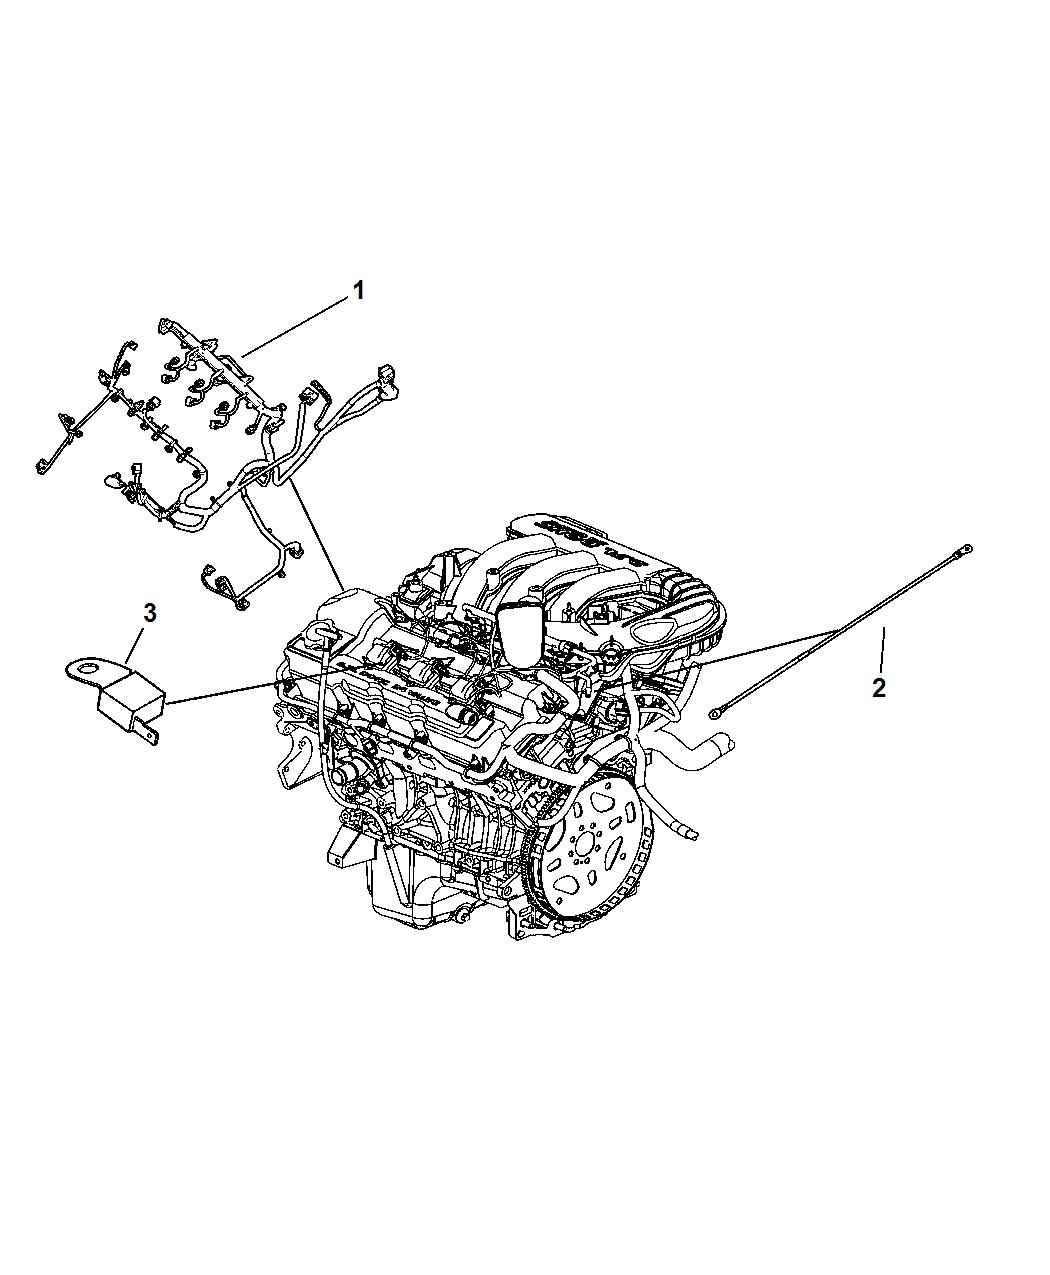 2006 dodge charger engine diagram - wiring diagram solve-upgrade-b -  solve-upgrade-b.agriturismoduemadonne.it  agriturismoduemadonne.it